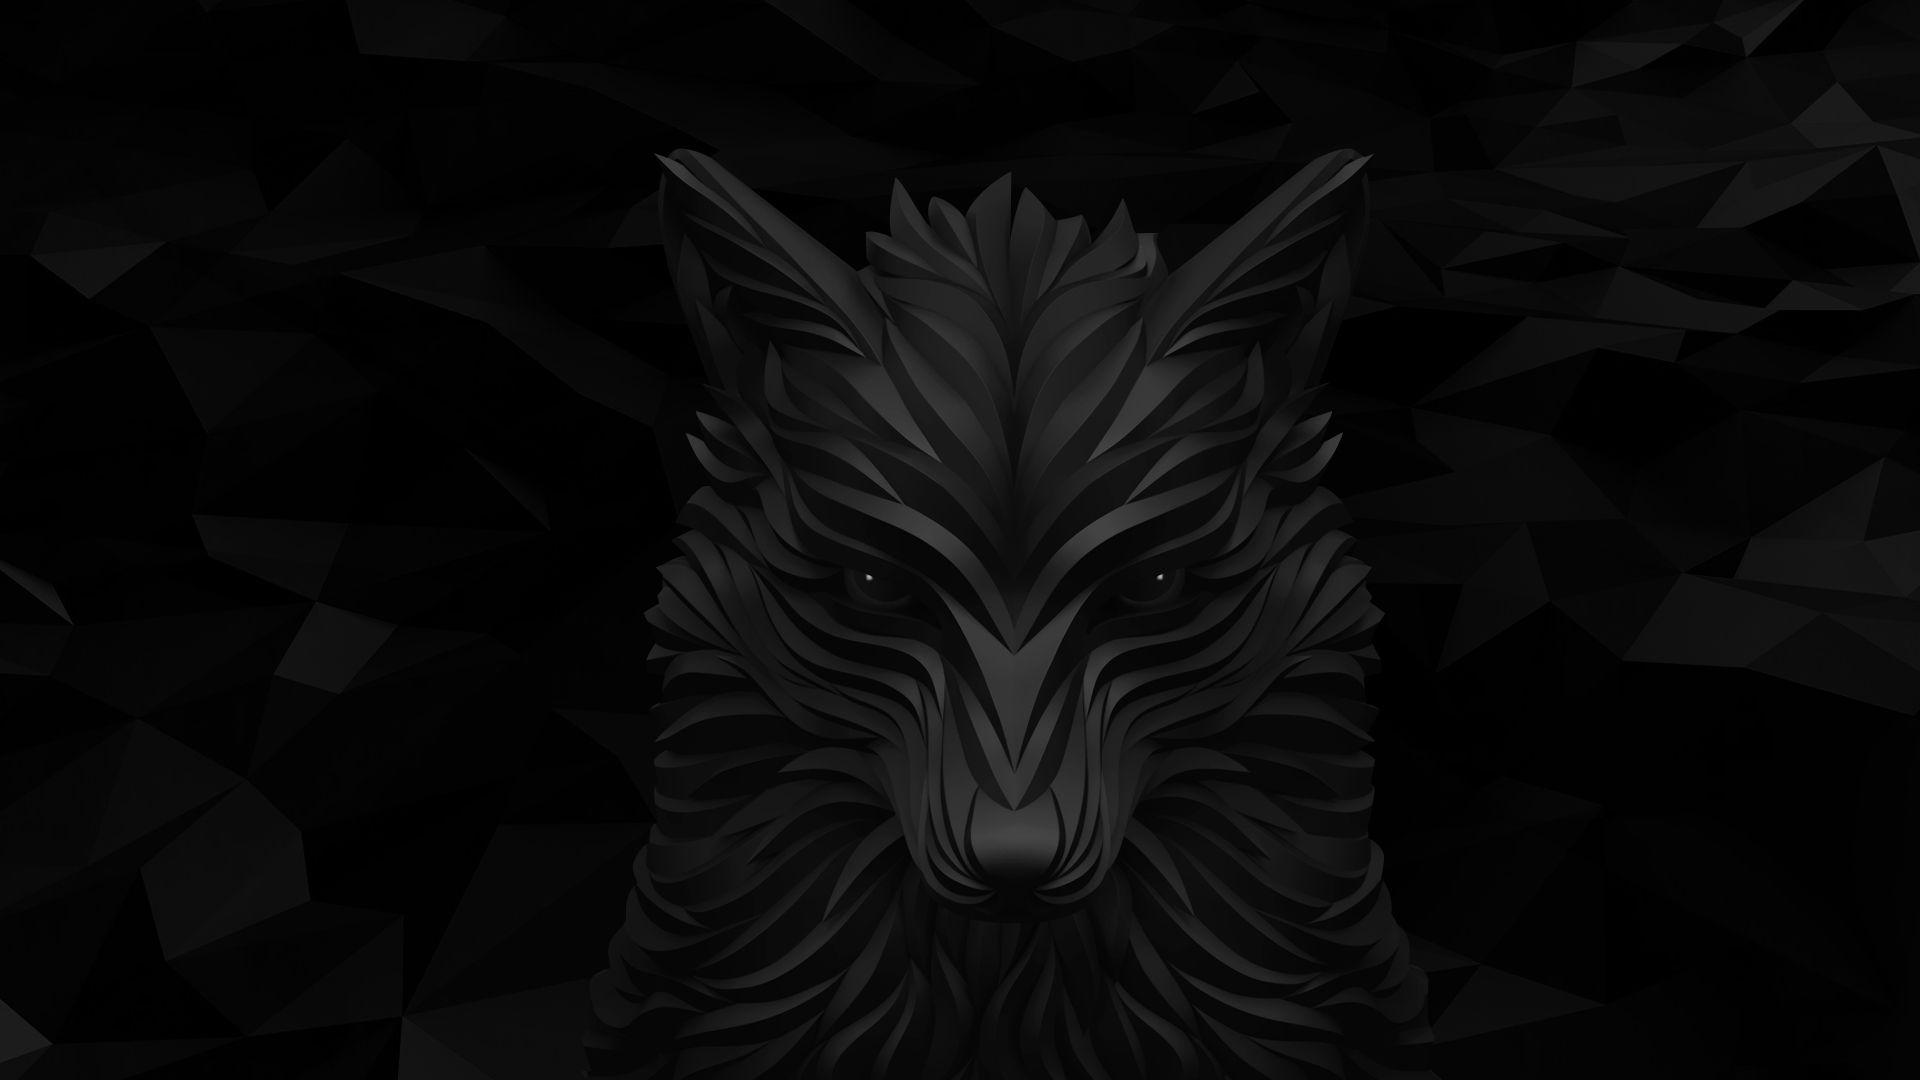 Black Wolf White Wolf 1920x1080 Iphone Black Black Wolf Wallpaper